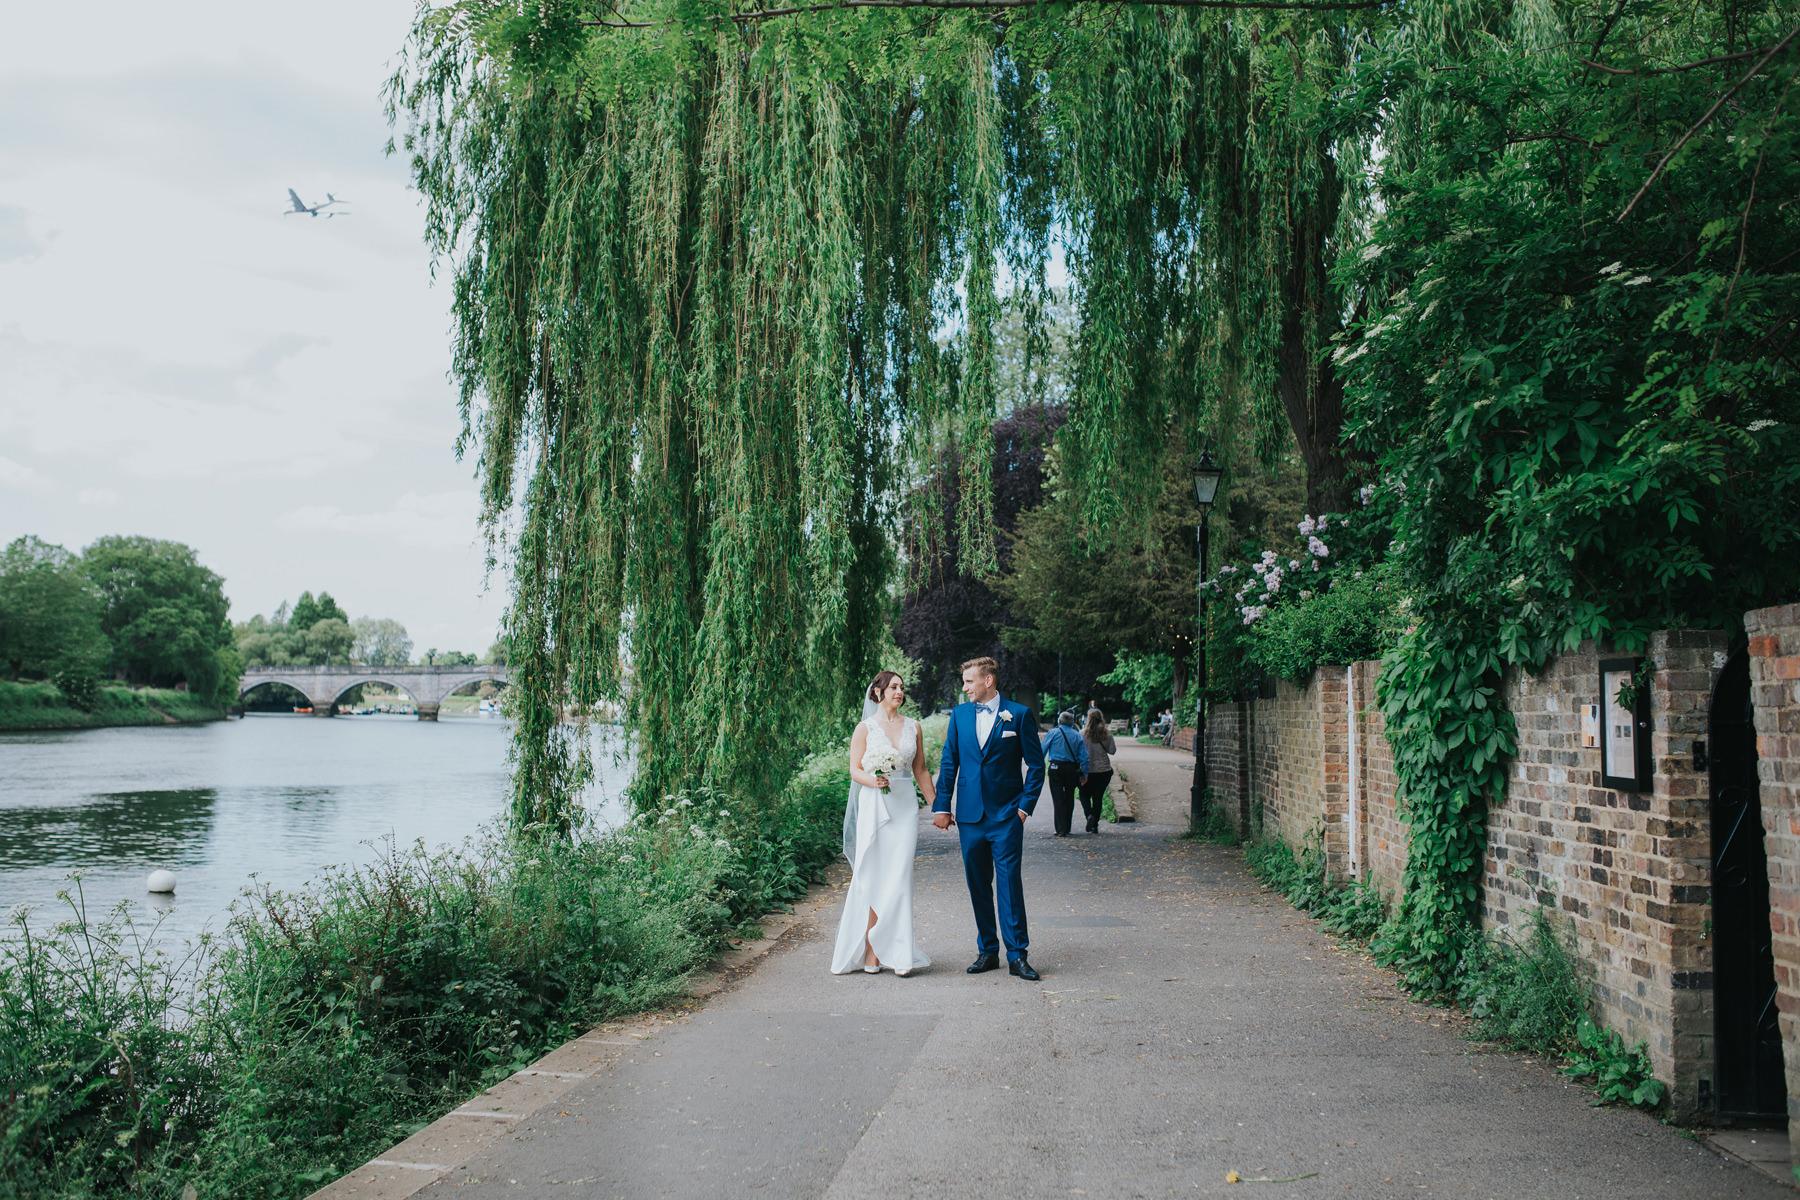 CRL-335-The Bingham wedding Richmond-Claire Rob bridal couple portraits on Thamespath.jpg